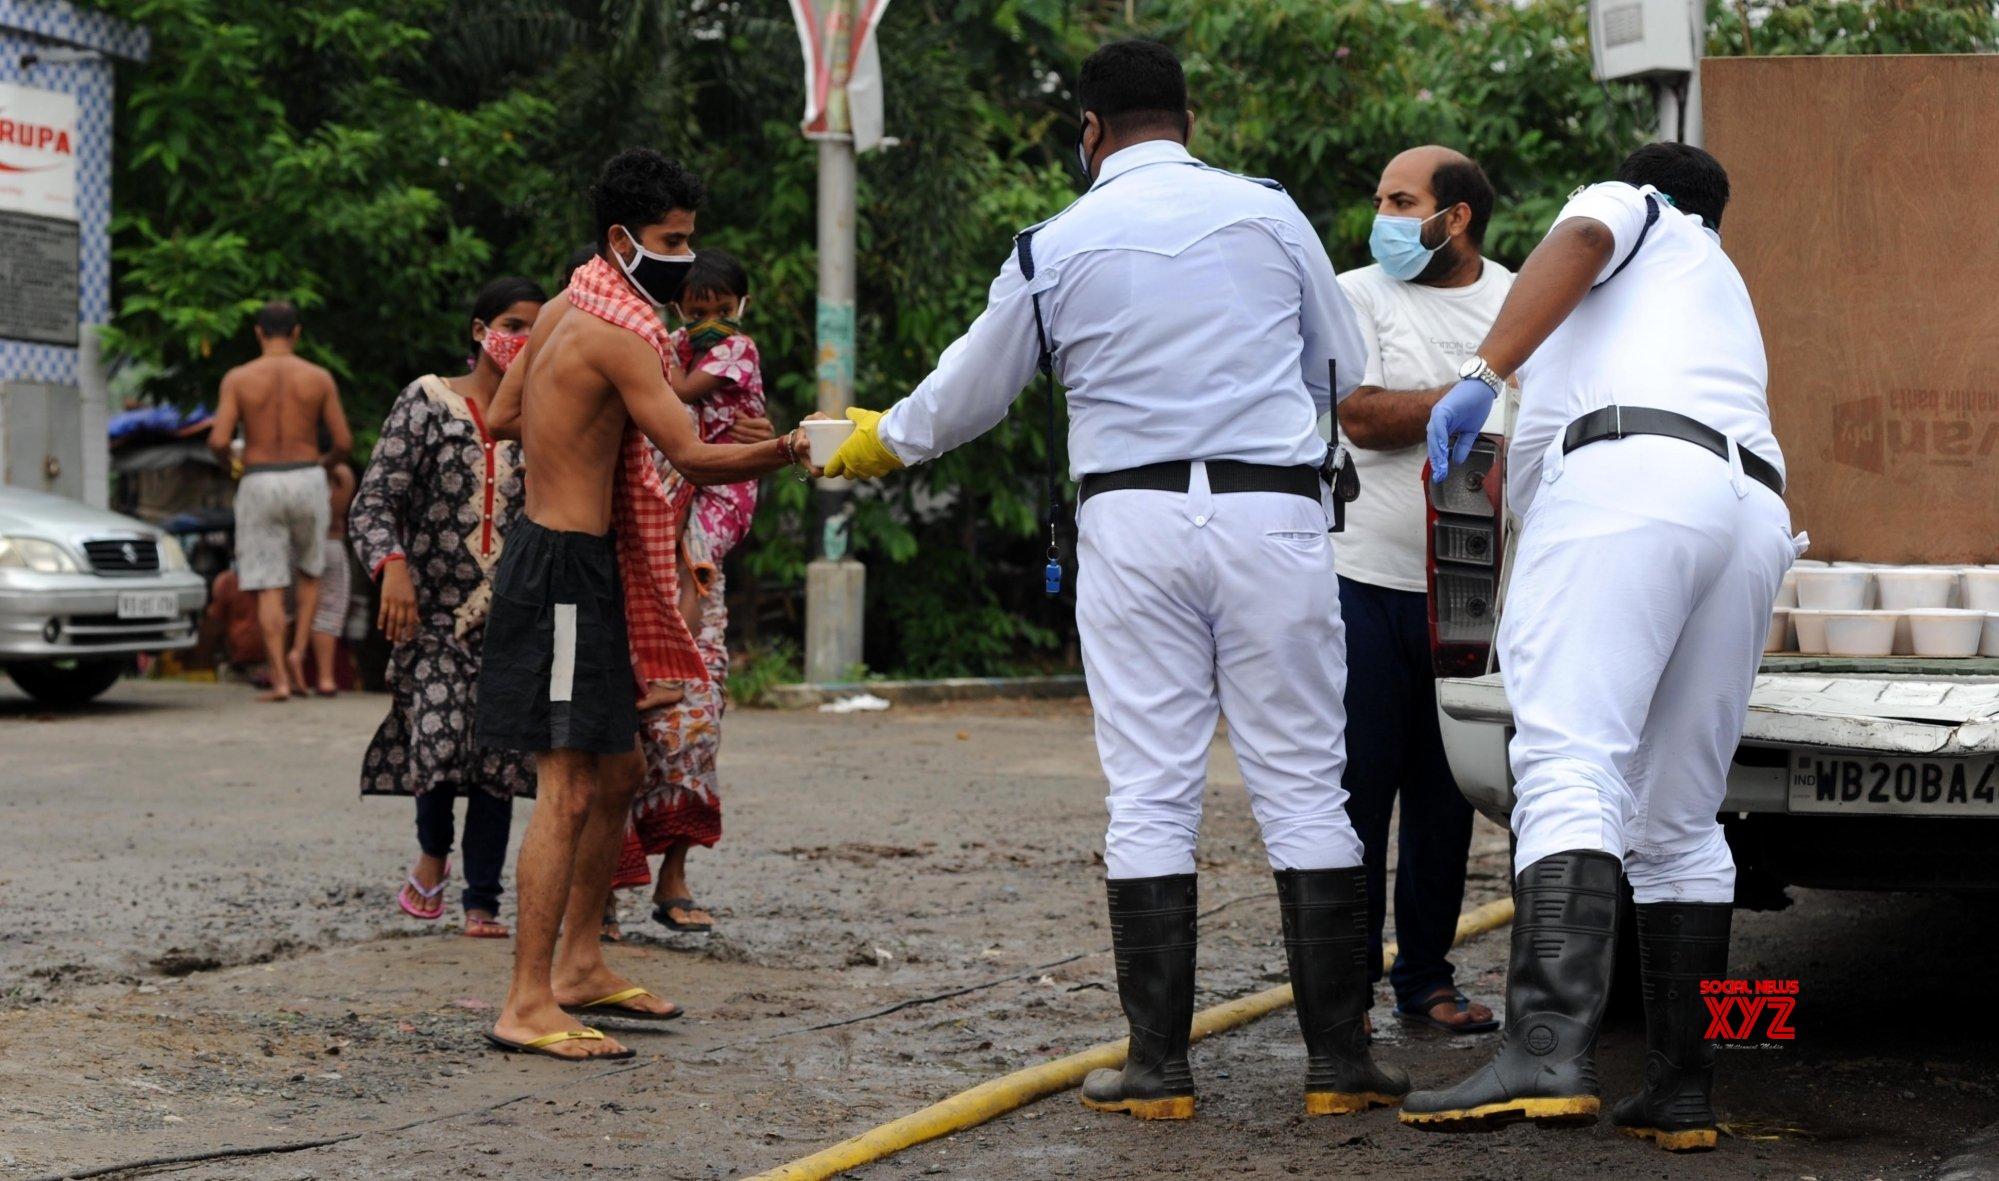 Kolkata: Kolkata police distributed food for needy people and footpath dwellers at Bypass on Mondayduring during the lockdown for COVID 19 Coronavirus pandemic in Kolkata. #Gallery